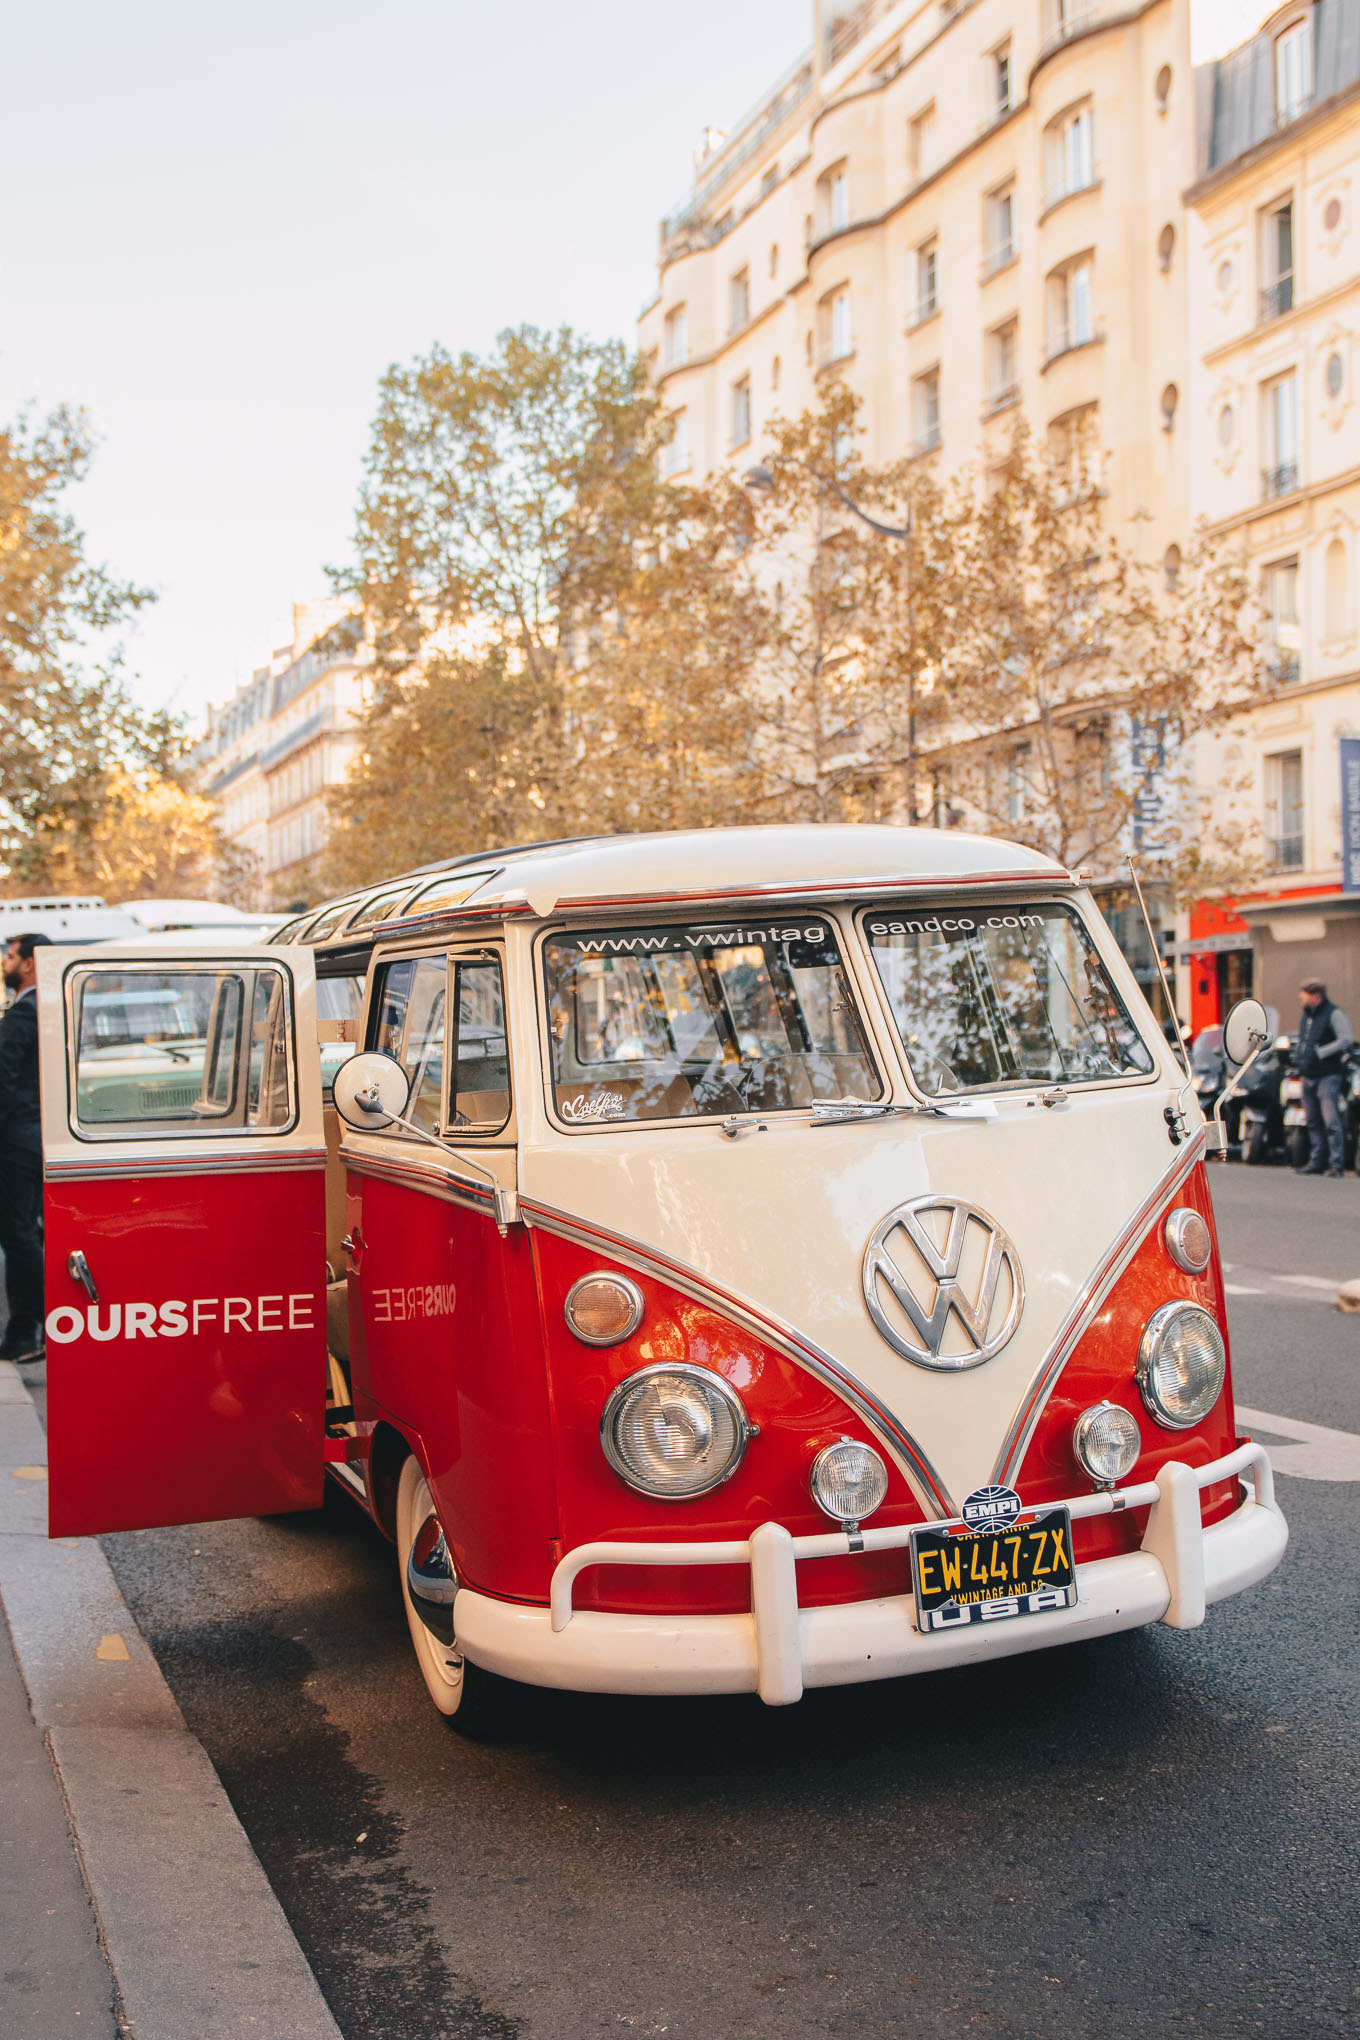 Retro VW California Paris tour